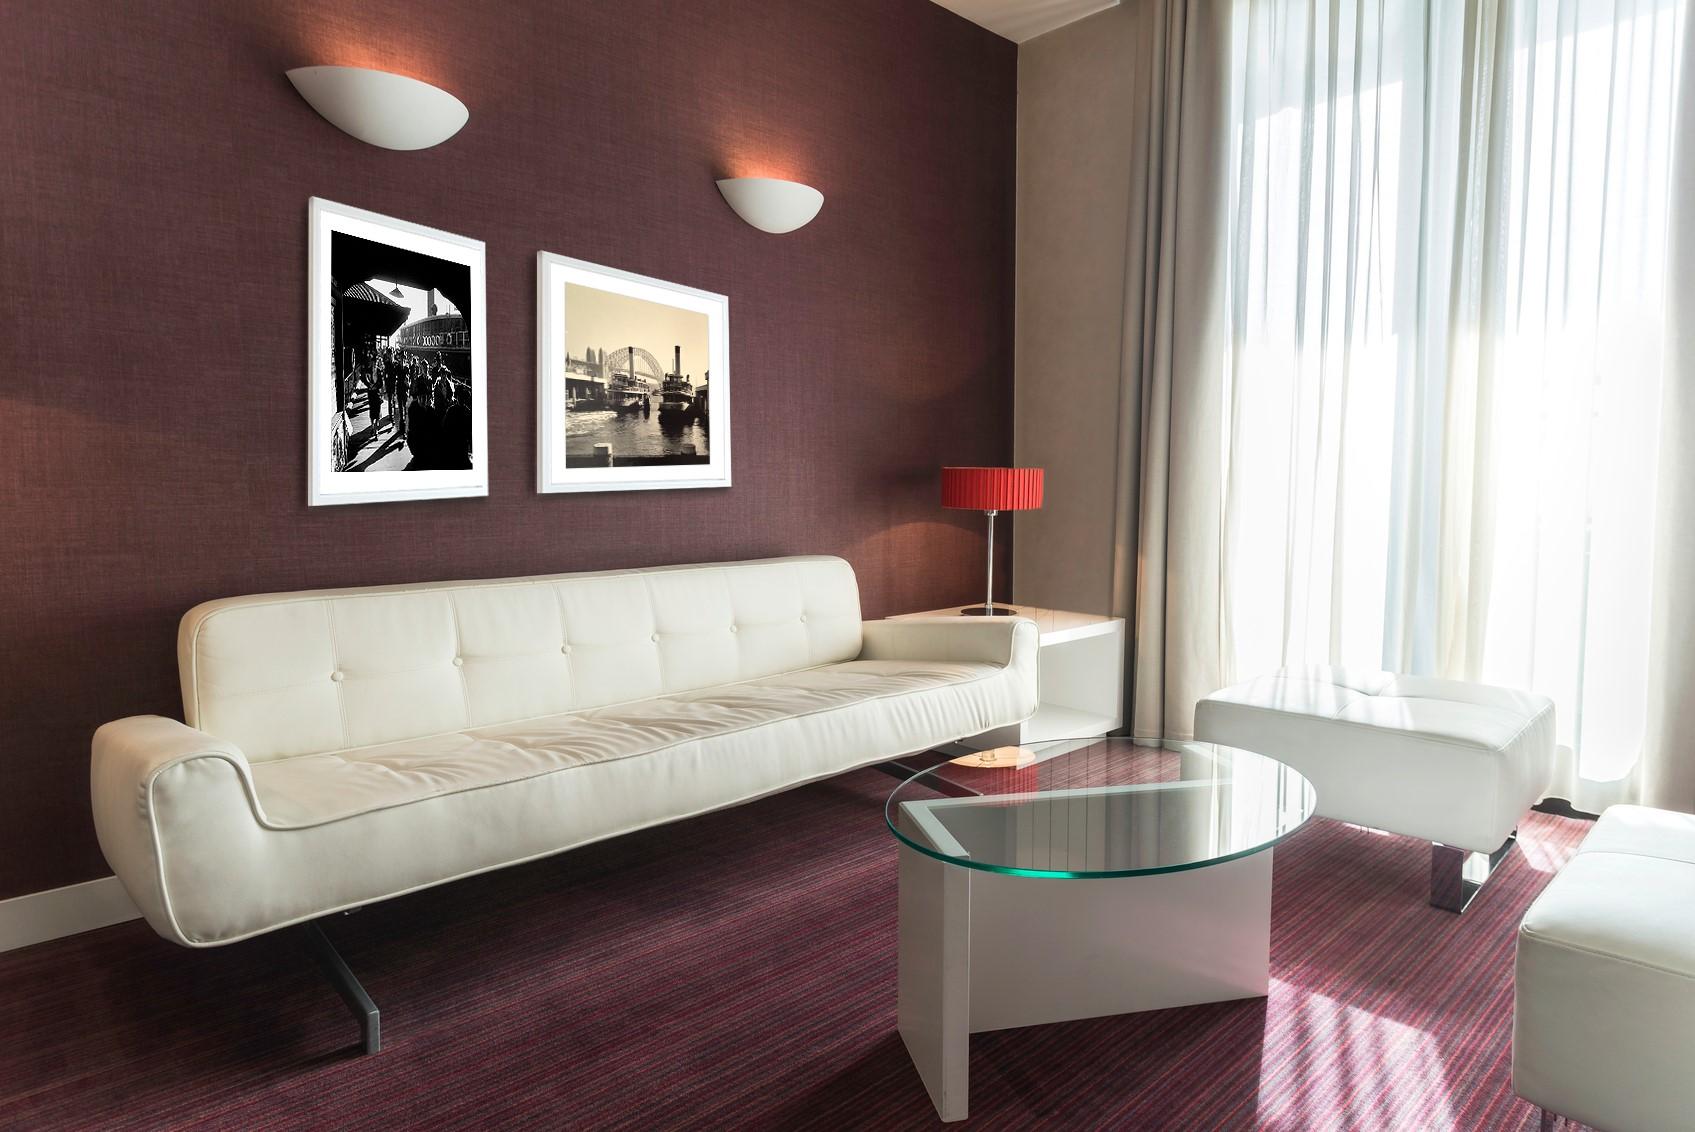 HOTELROOMLOUNGE